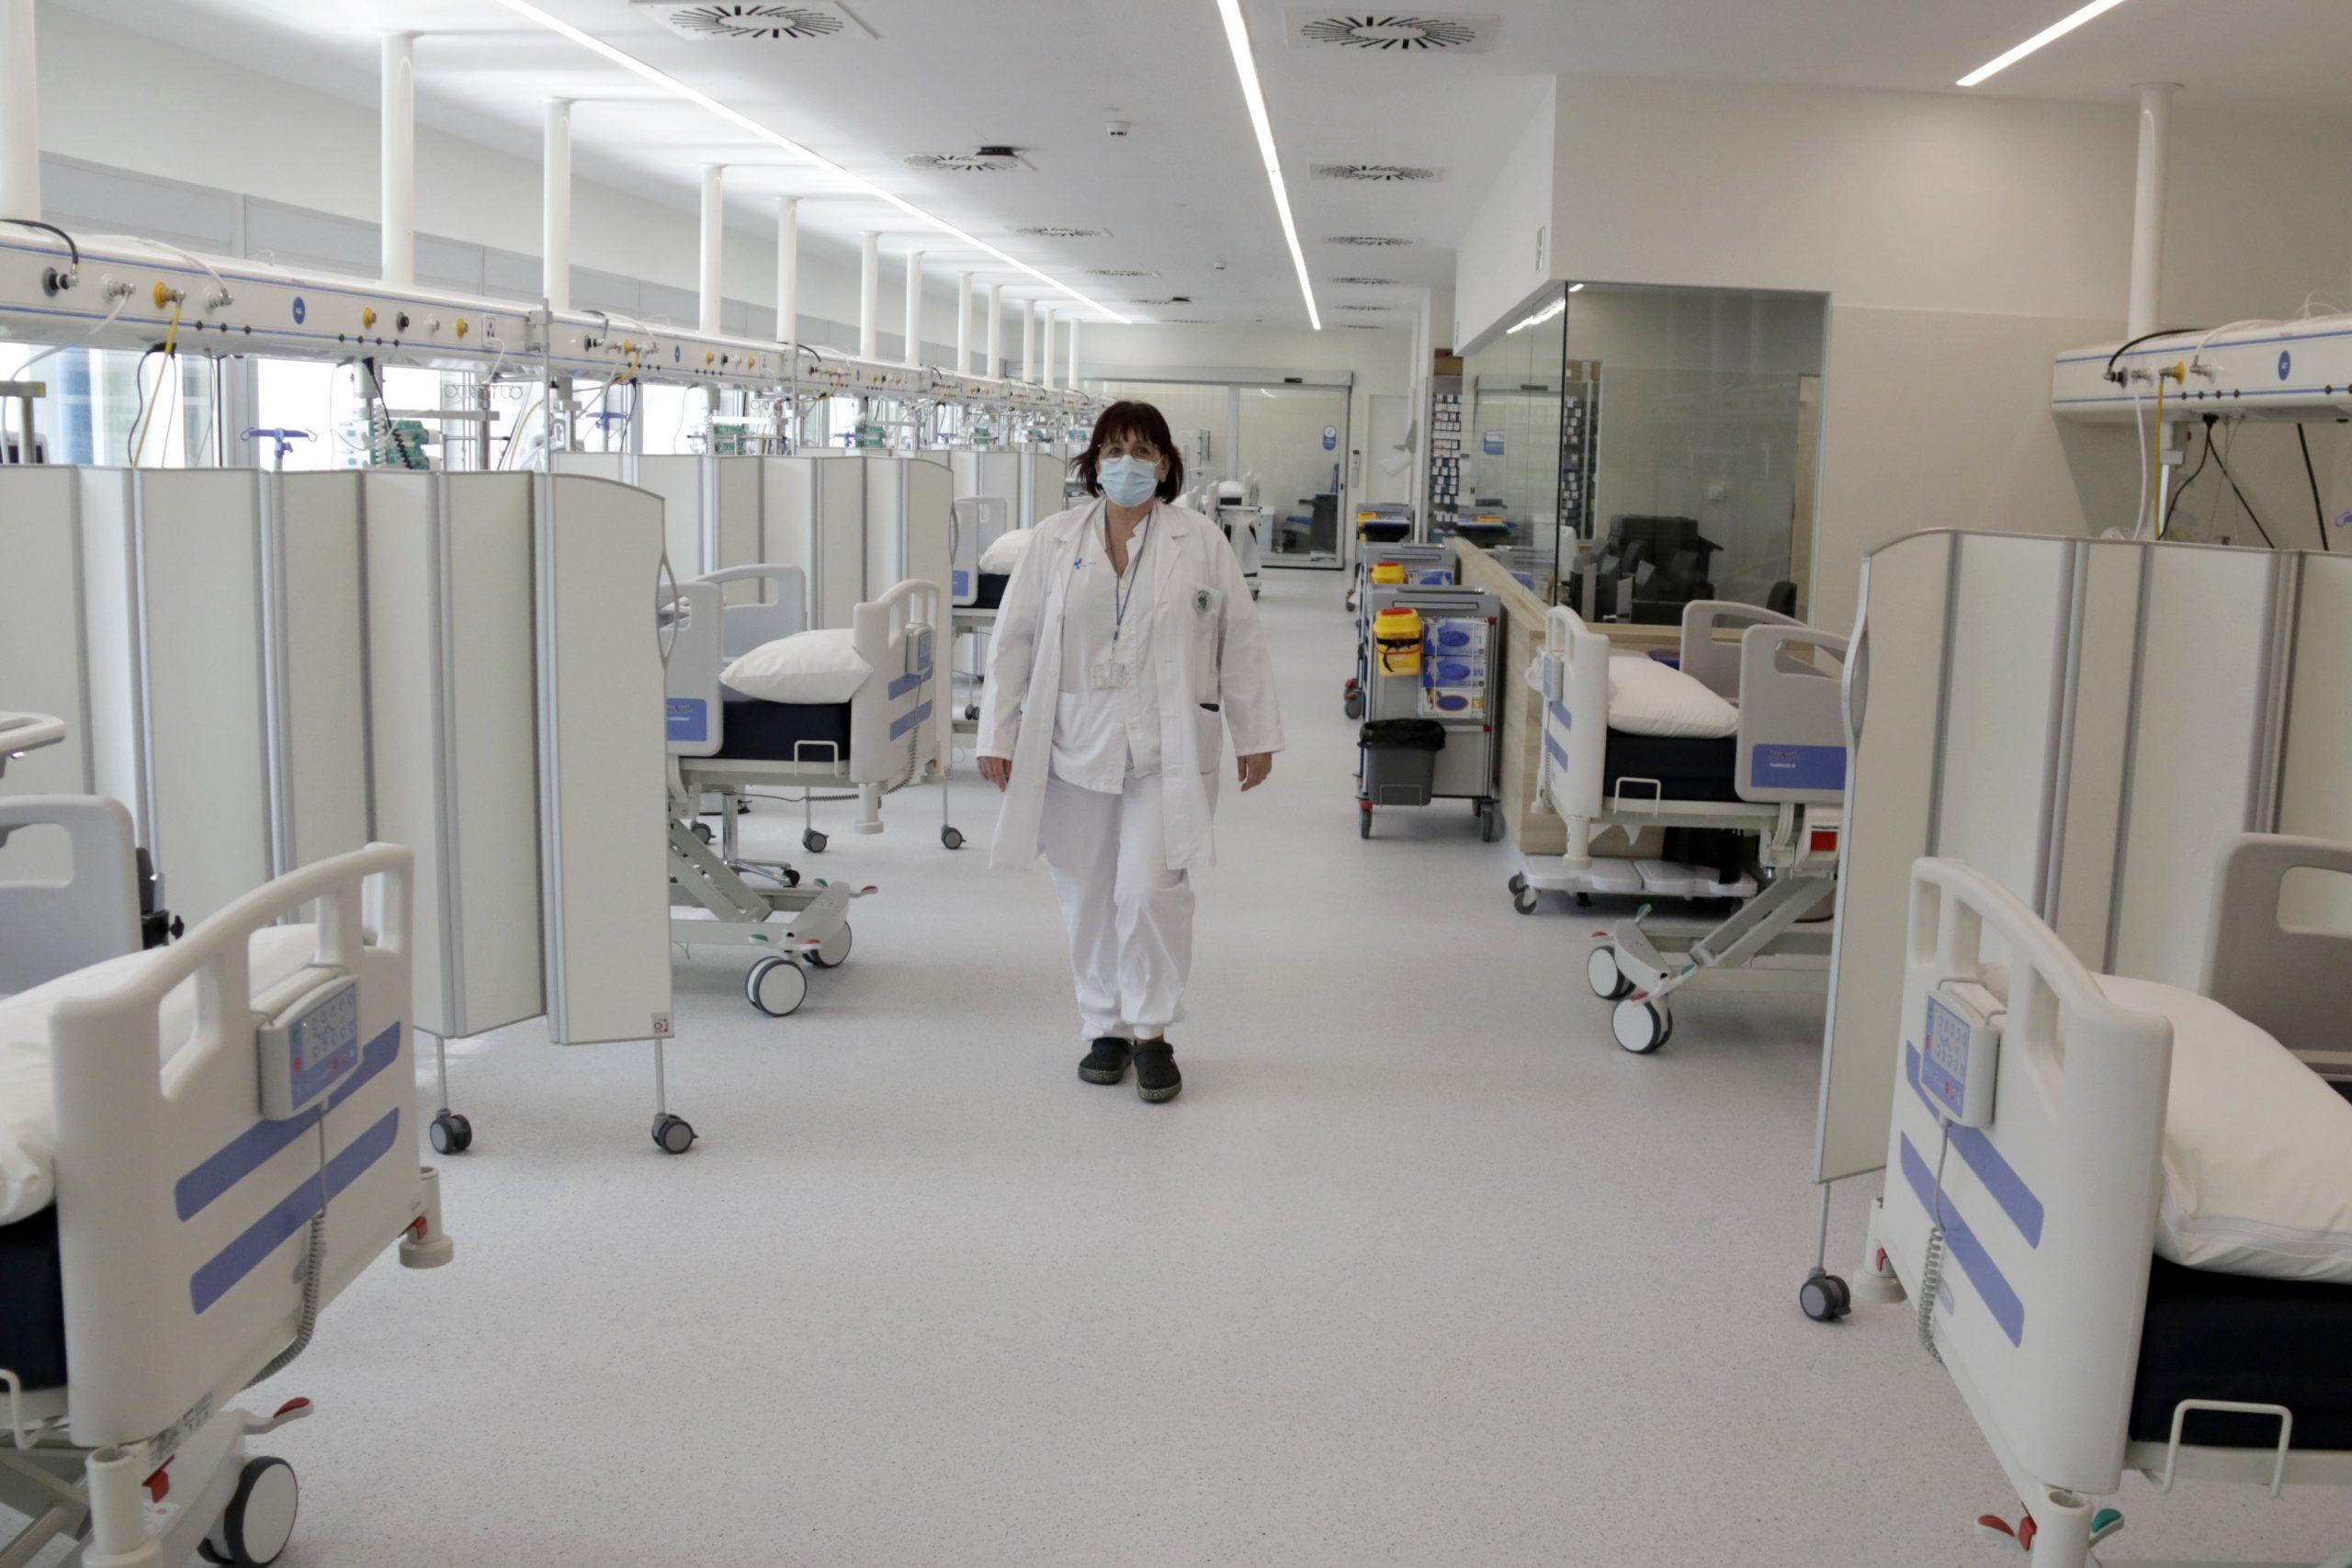 La nova UCI de l'edifici annex a l'hospital Moisès Broggi   ACN